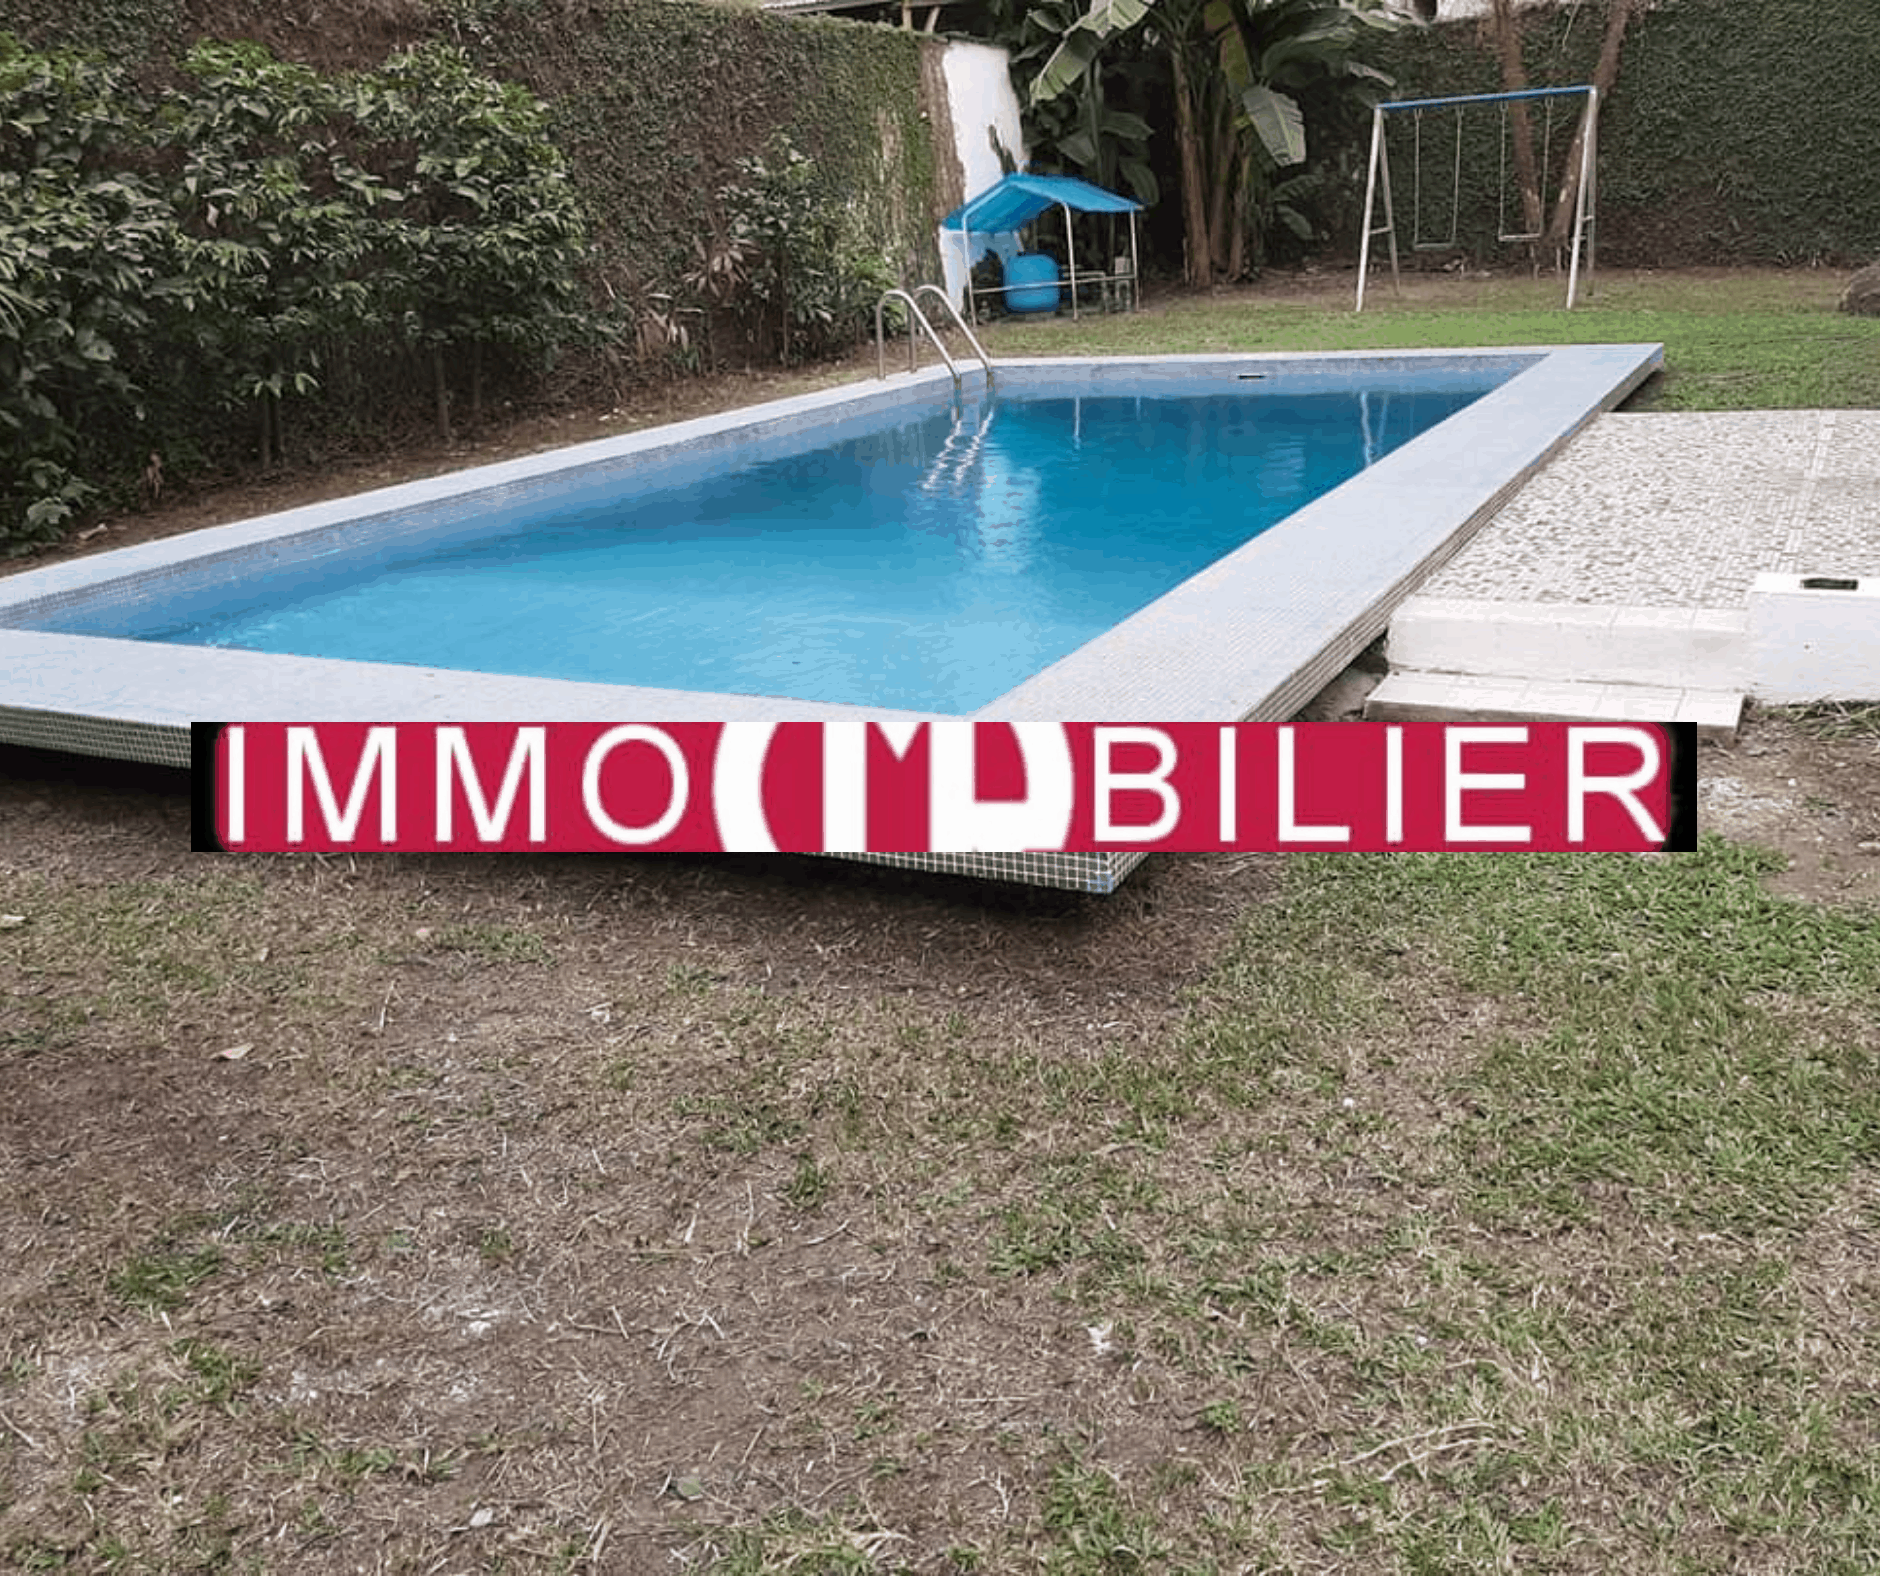 House (Villa) to rent - Douala, Bonapriso, Dominique Savio primaire - 1 living room(s), 3 bedroom(s), 2 bathroom(s) - 1 800 000 FCFA / month